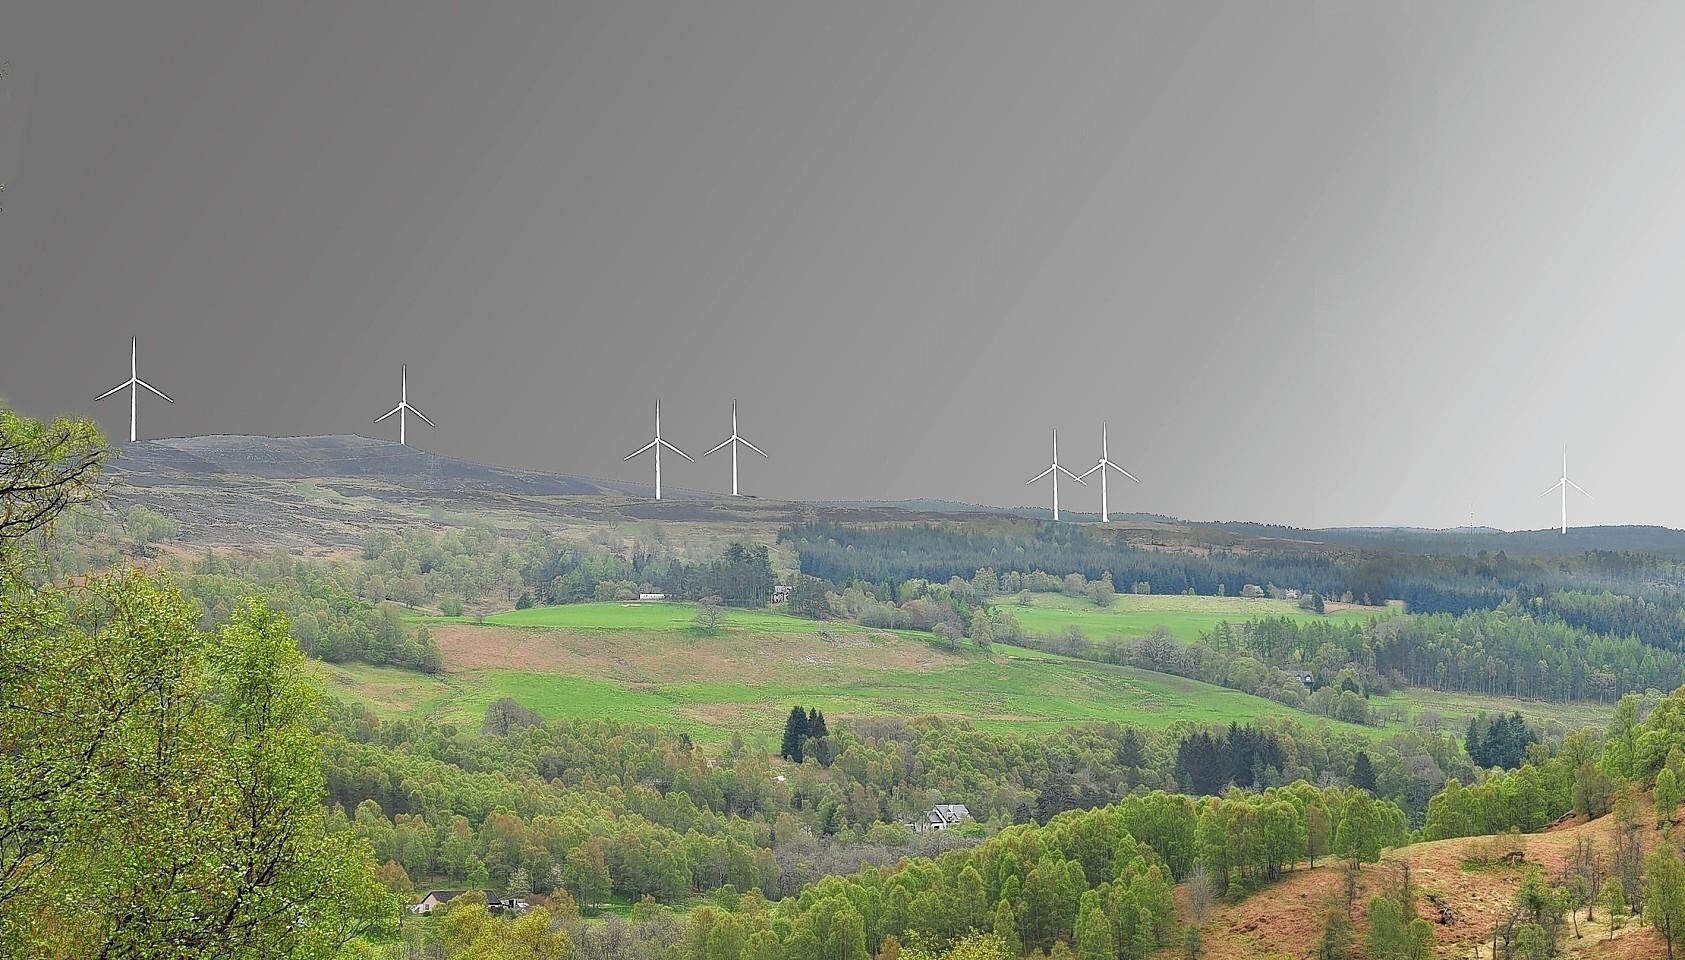 Glen Affric windfarm